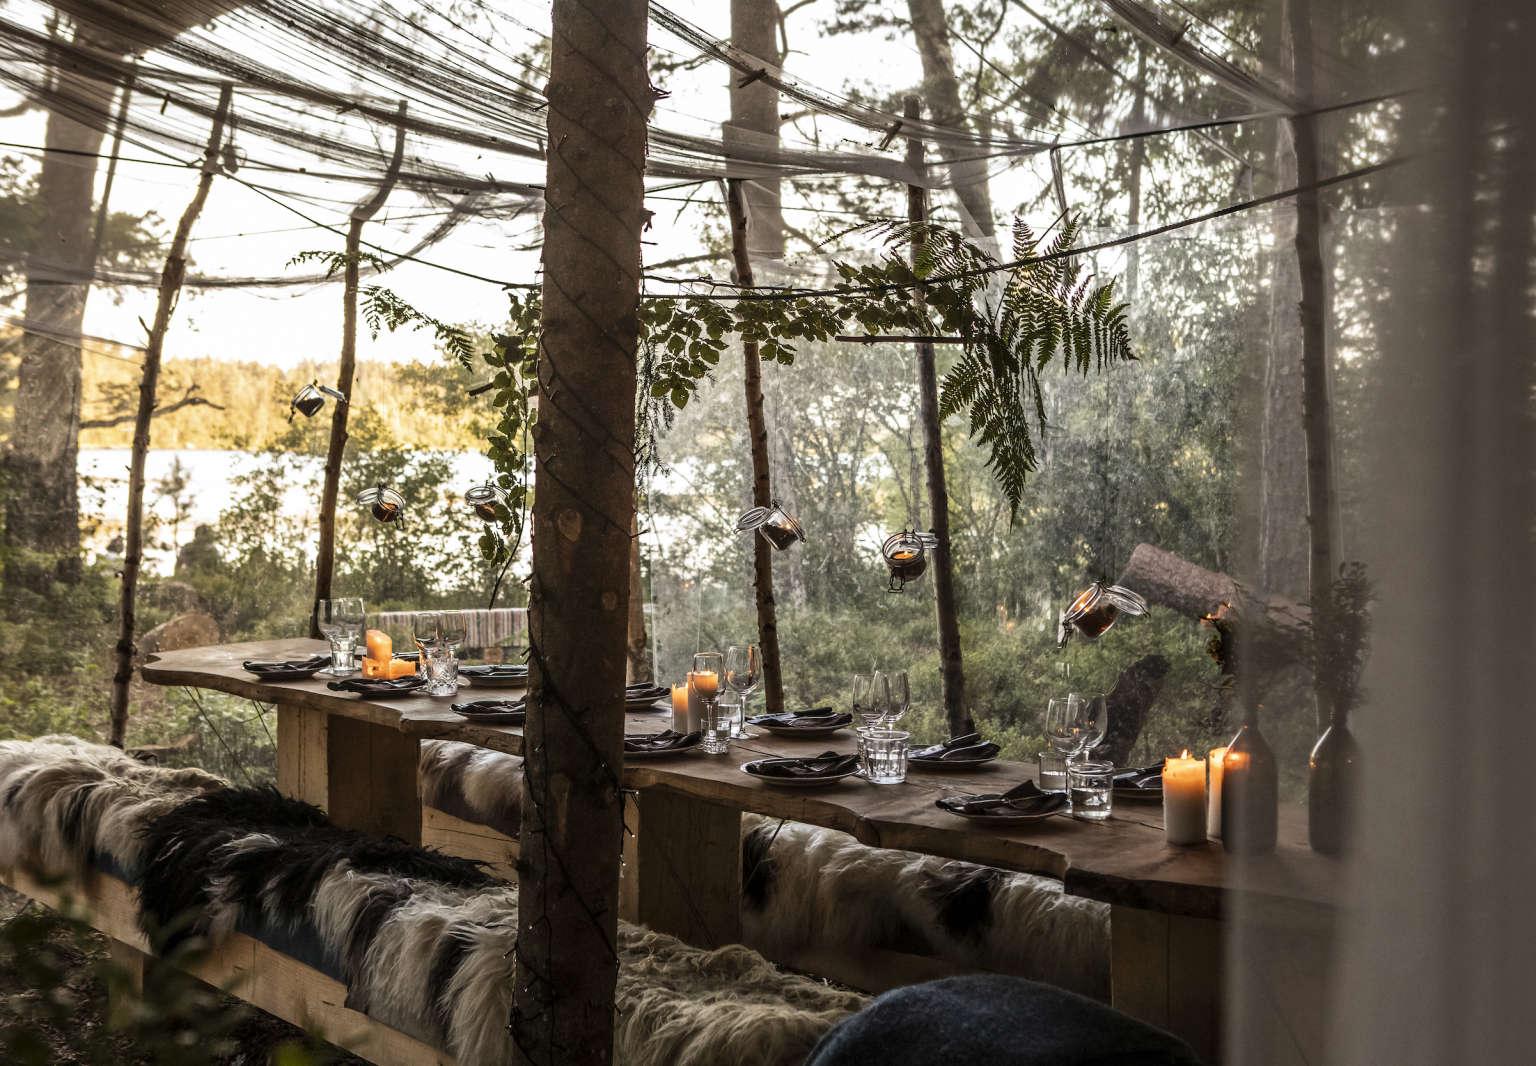 stedsans in the woods restaurant